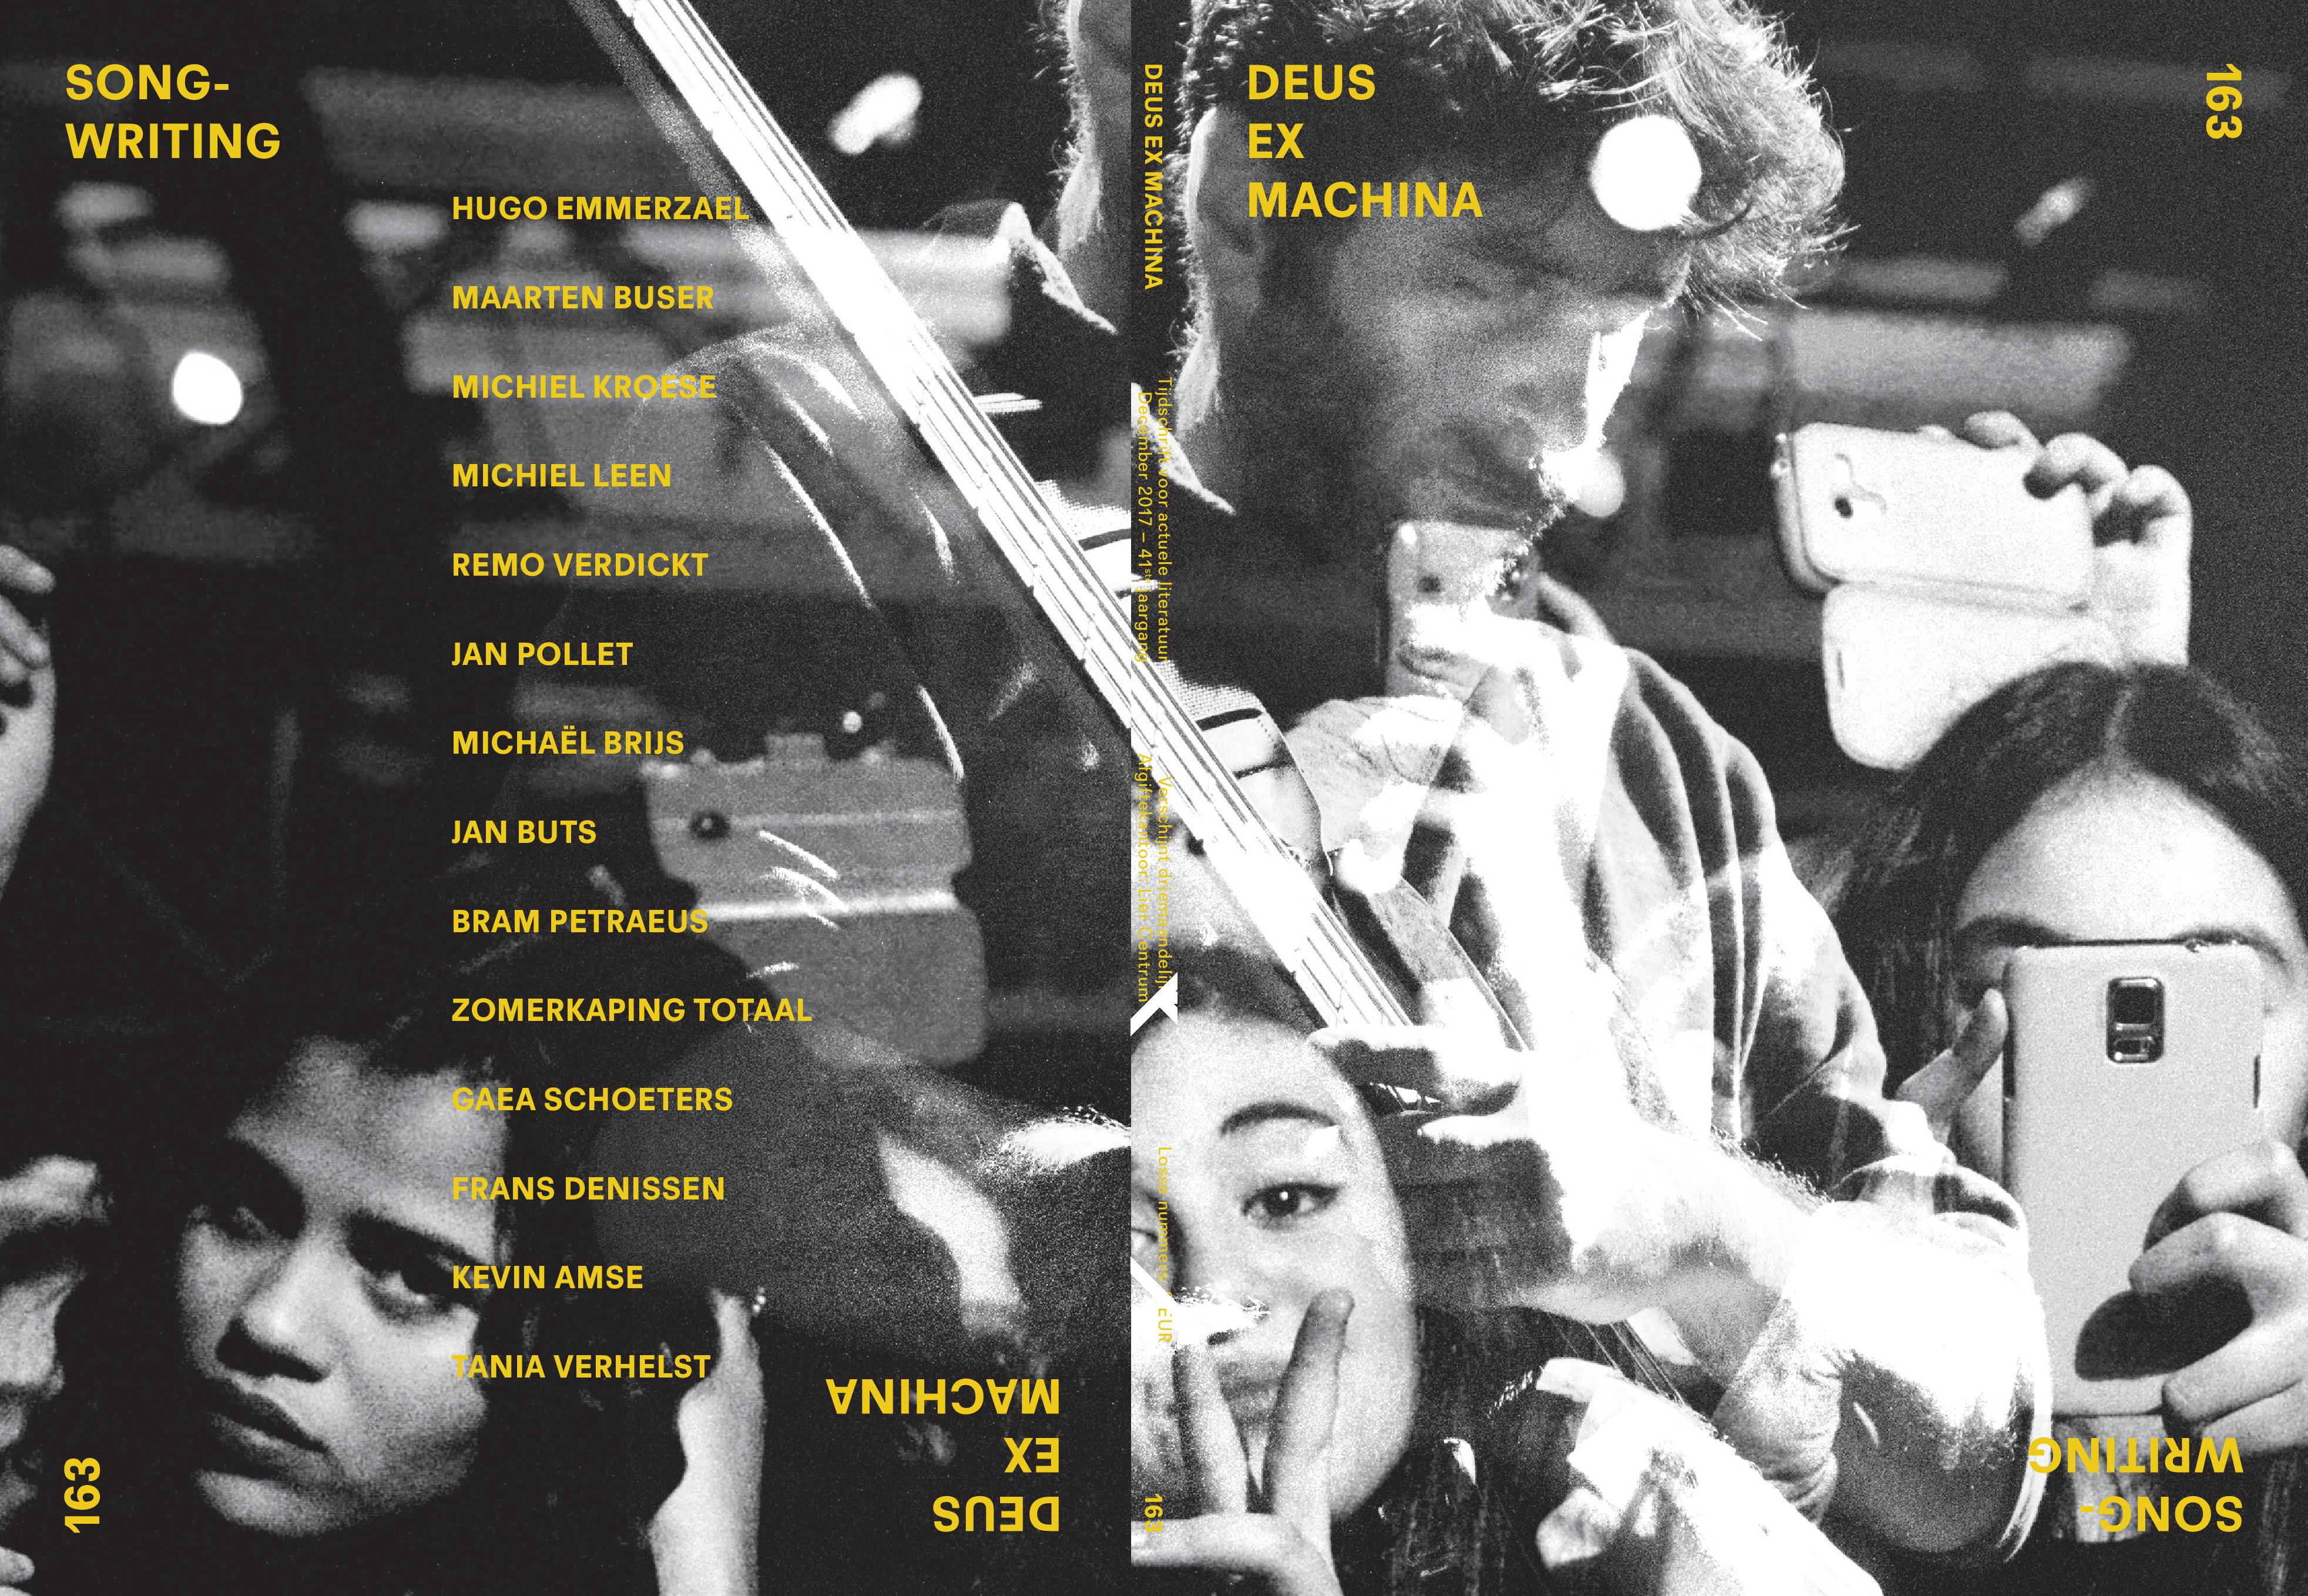 'Une chanson est un Gesamtkunstwerk' – Bertrand Cantat